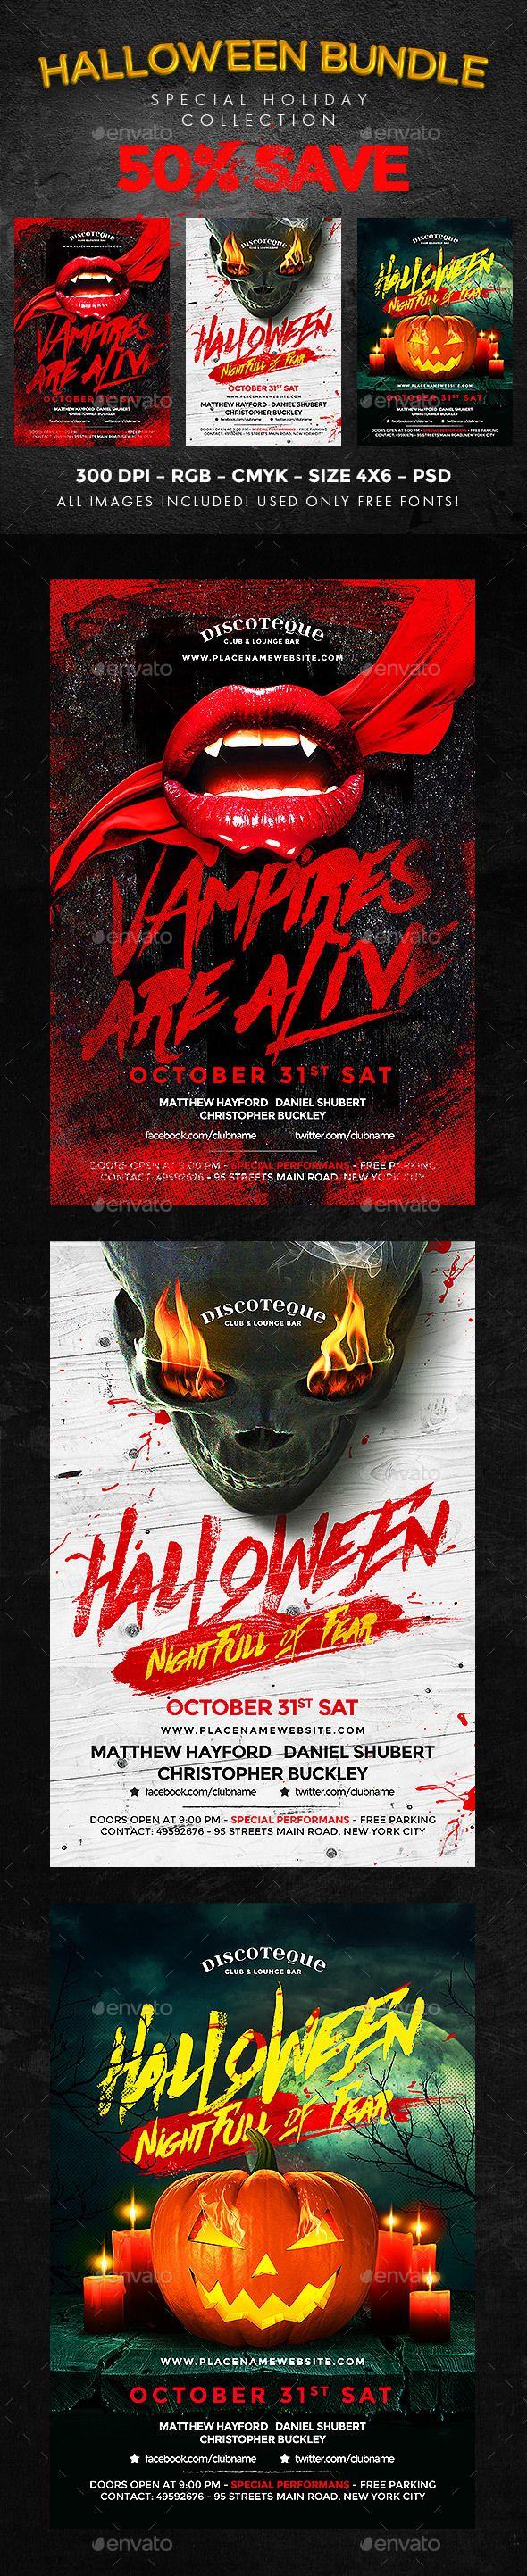 Free Halloween Flyer Templates Photoshop Erkalnathandedecker